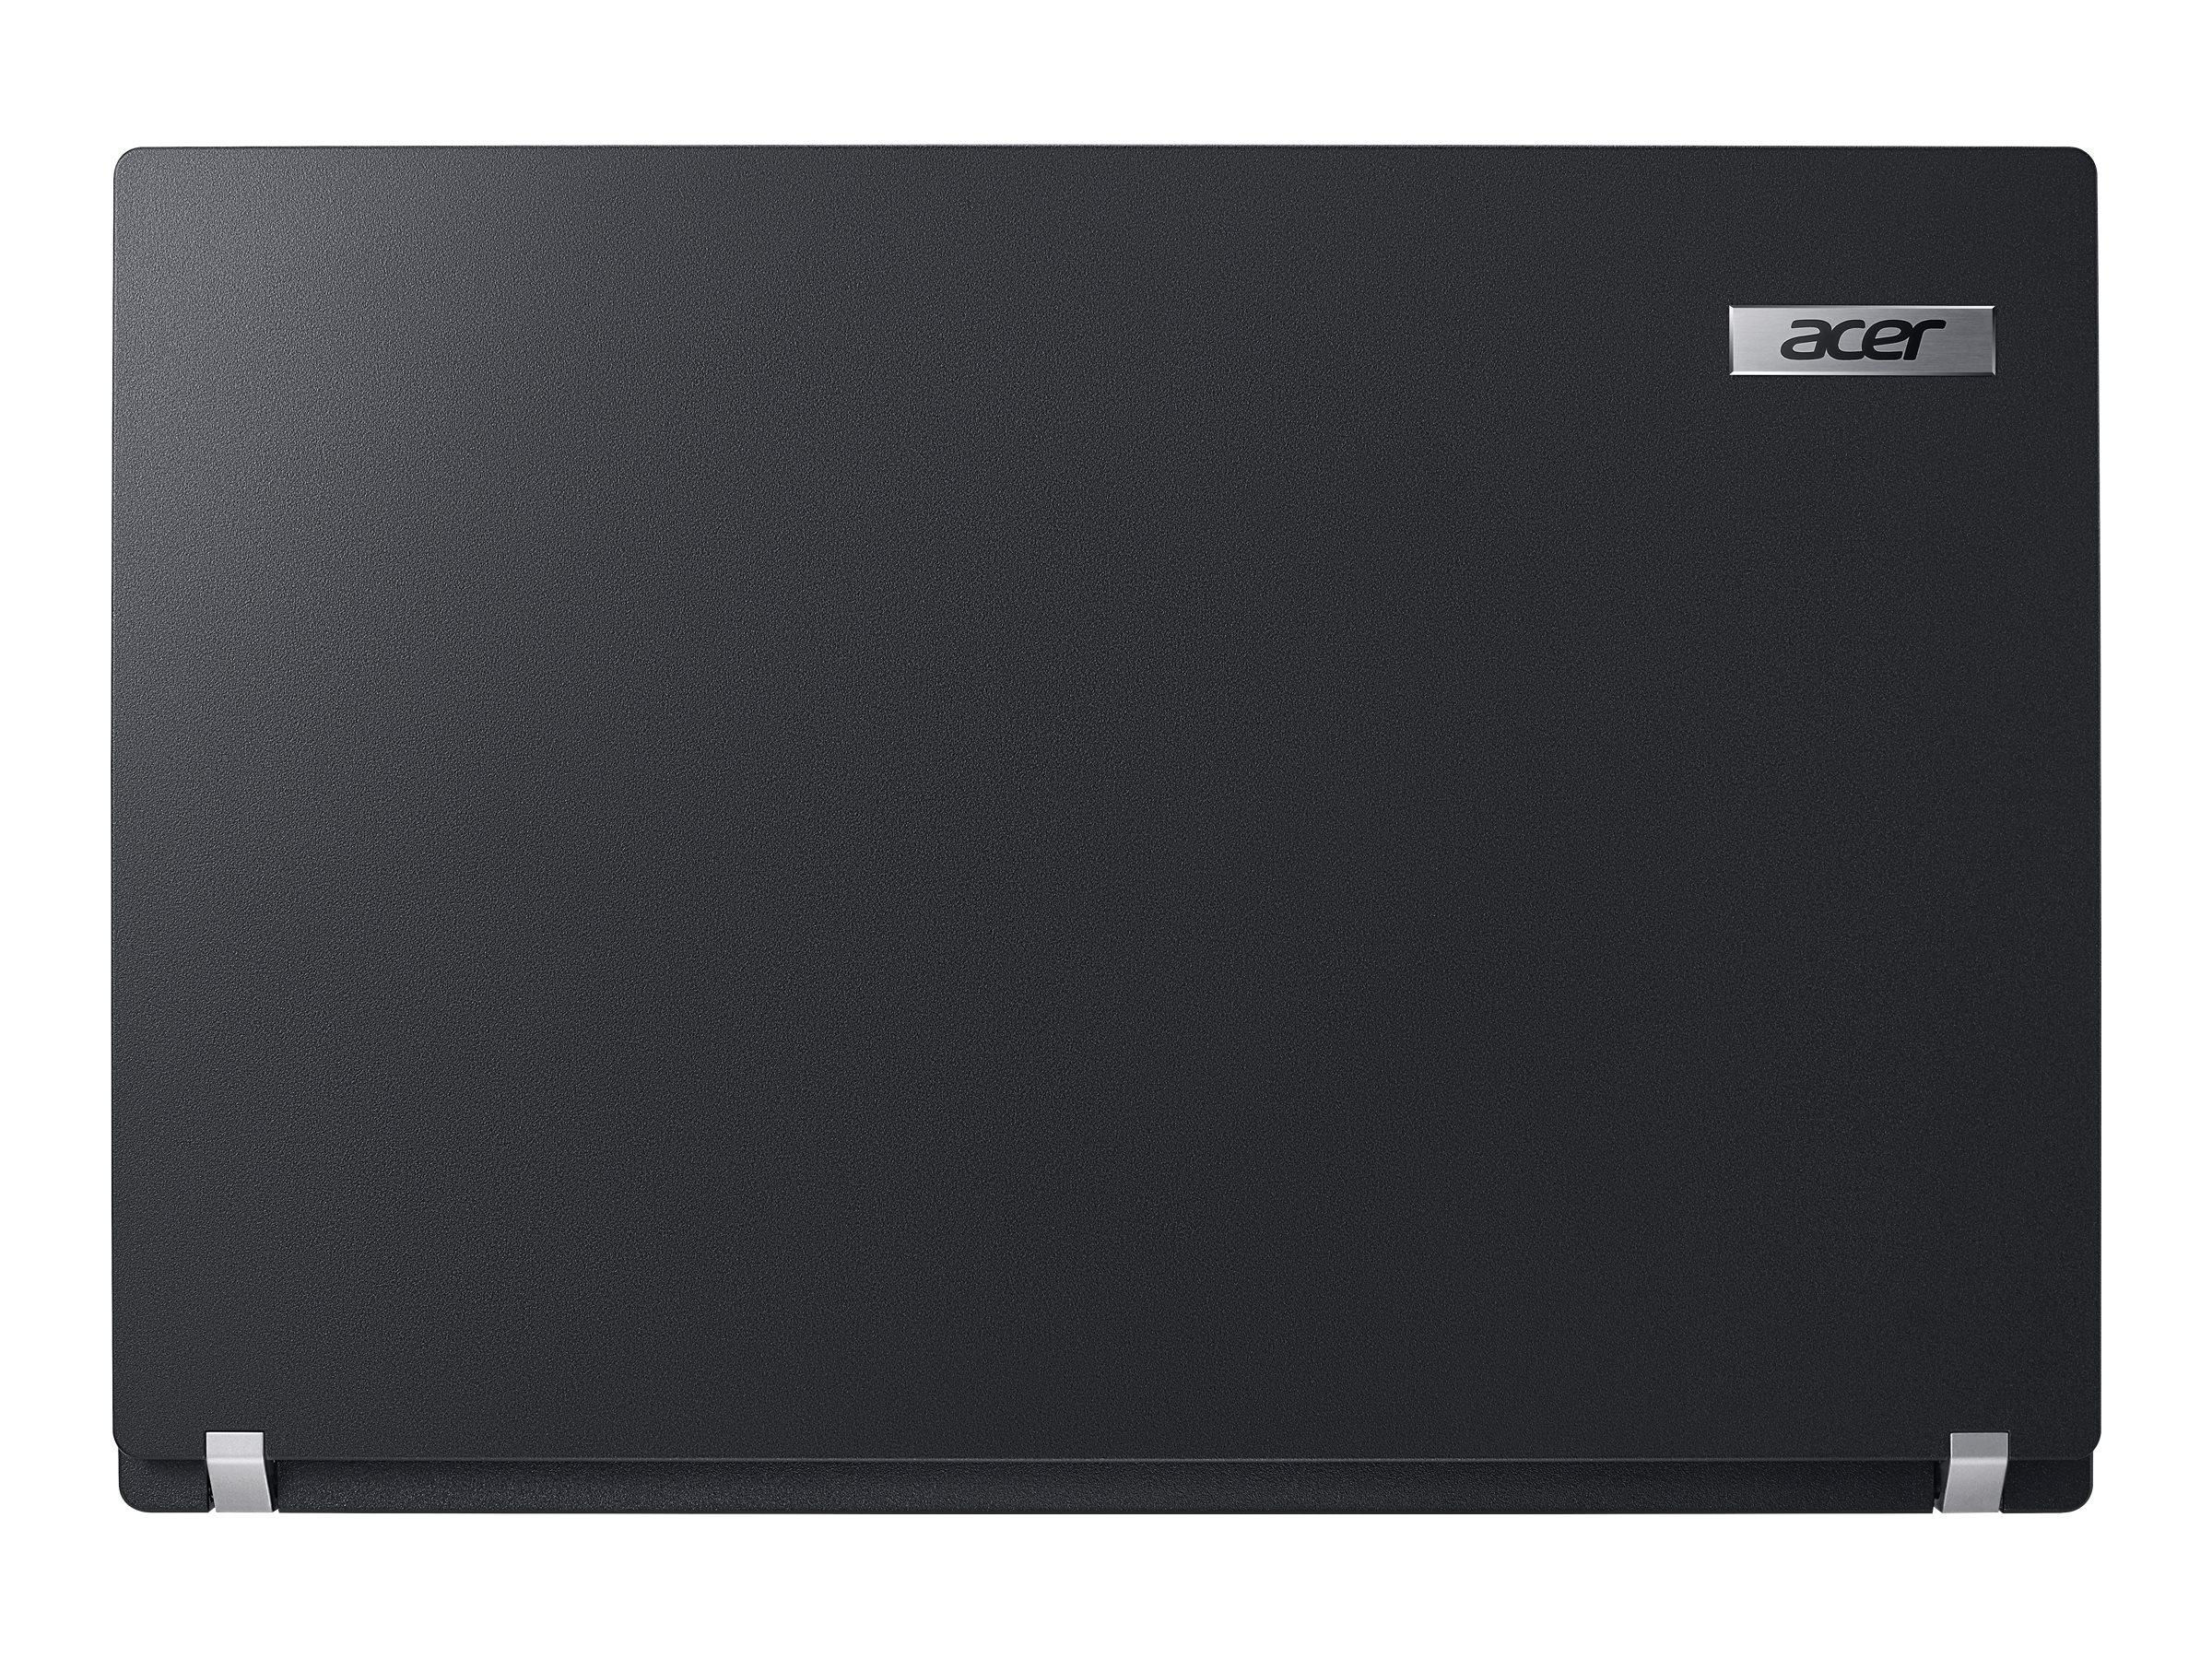 Acer NX.VDVAA.001 Image 5